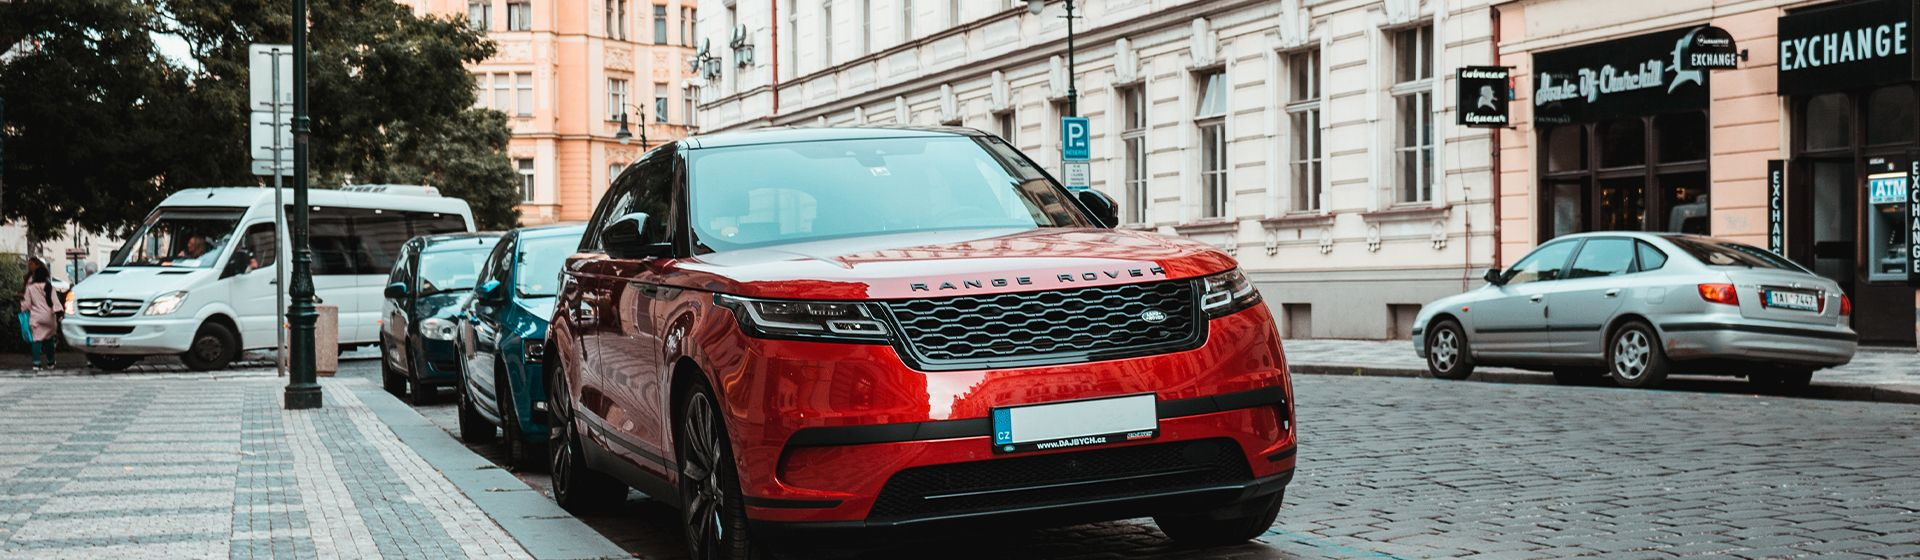 Company Cars - good or bad?